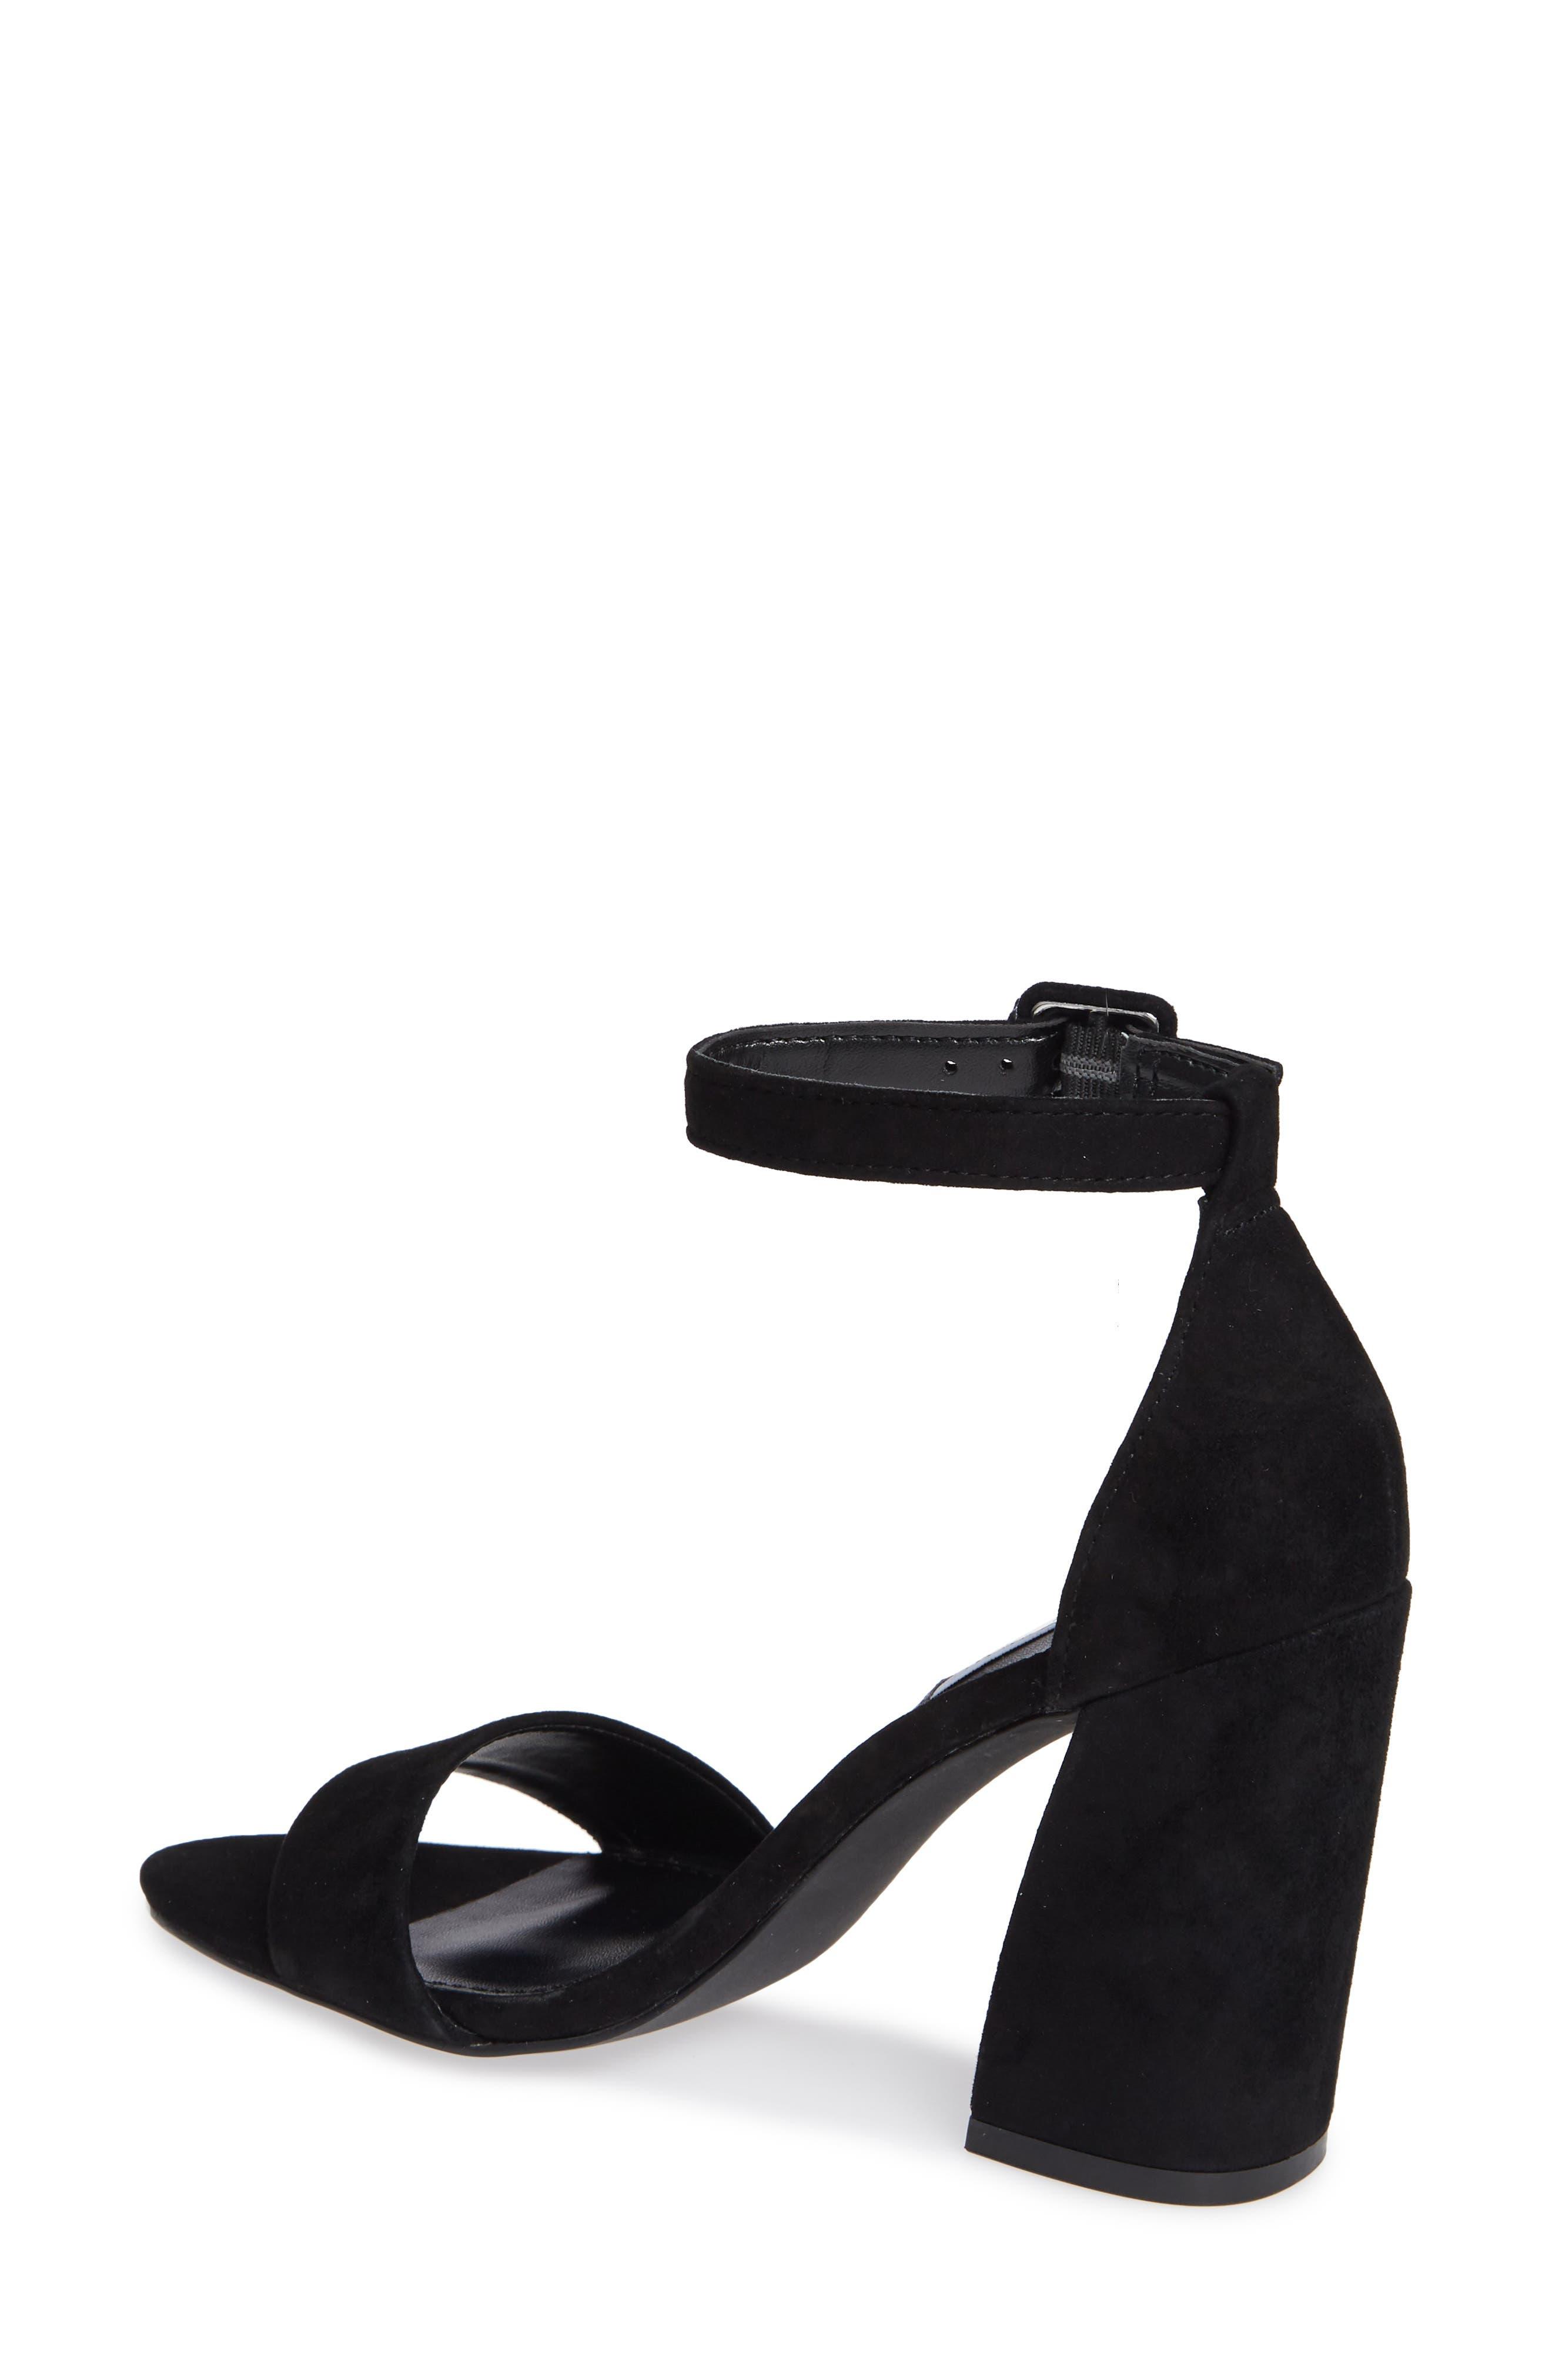 Joss Ankle Strap Sandal,                             Alternate thumbnail 2, color,                             BLACK SUEDE